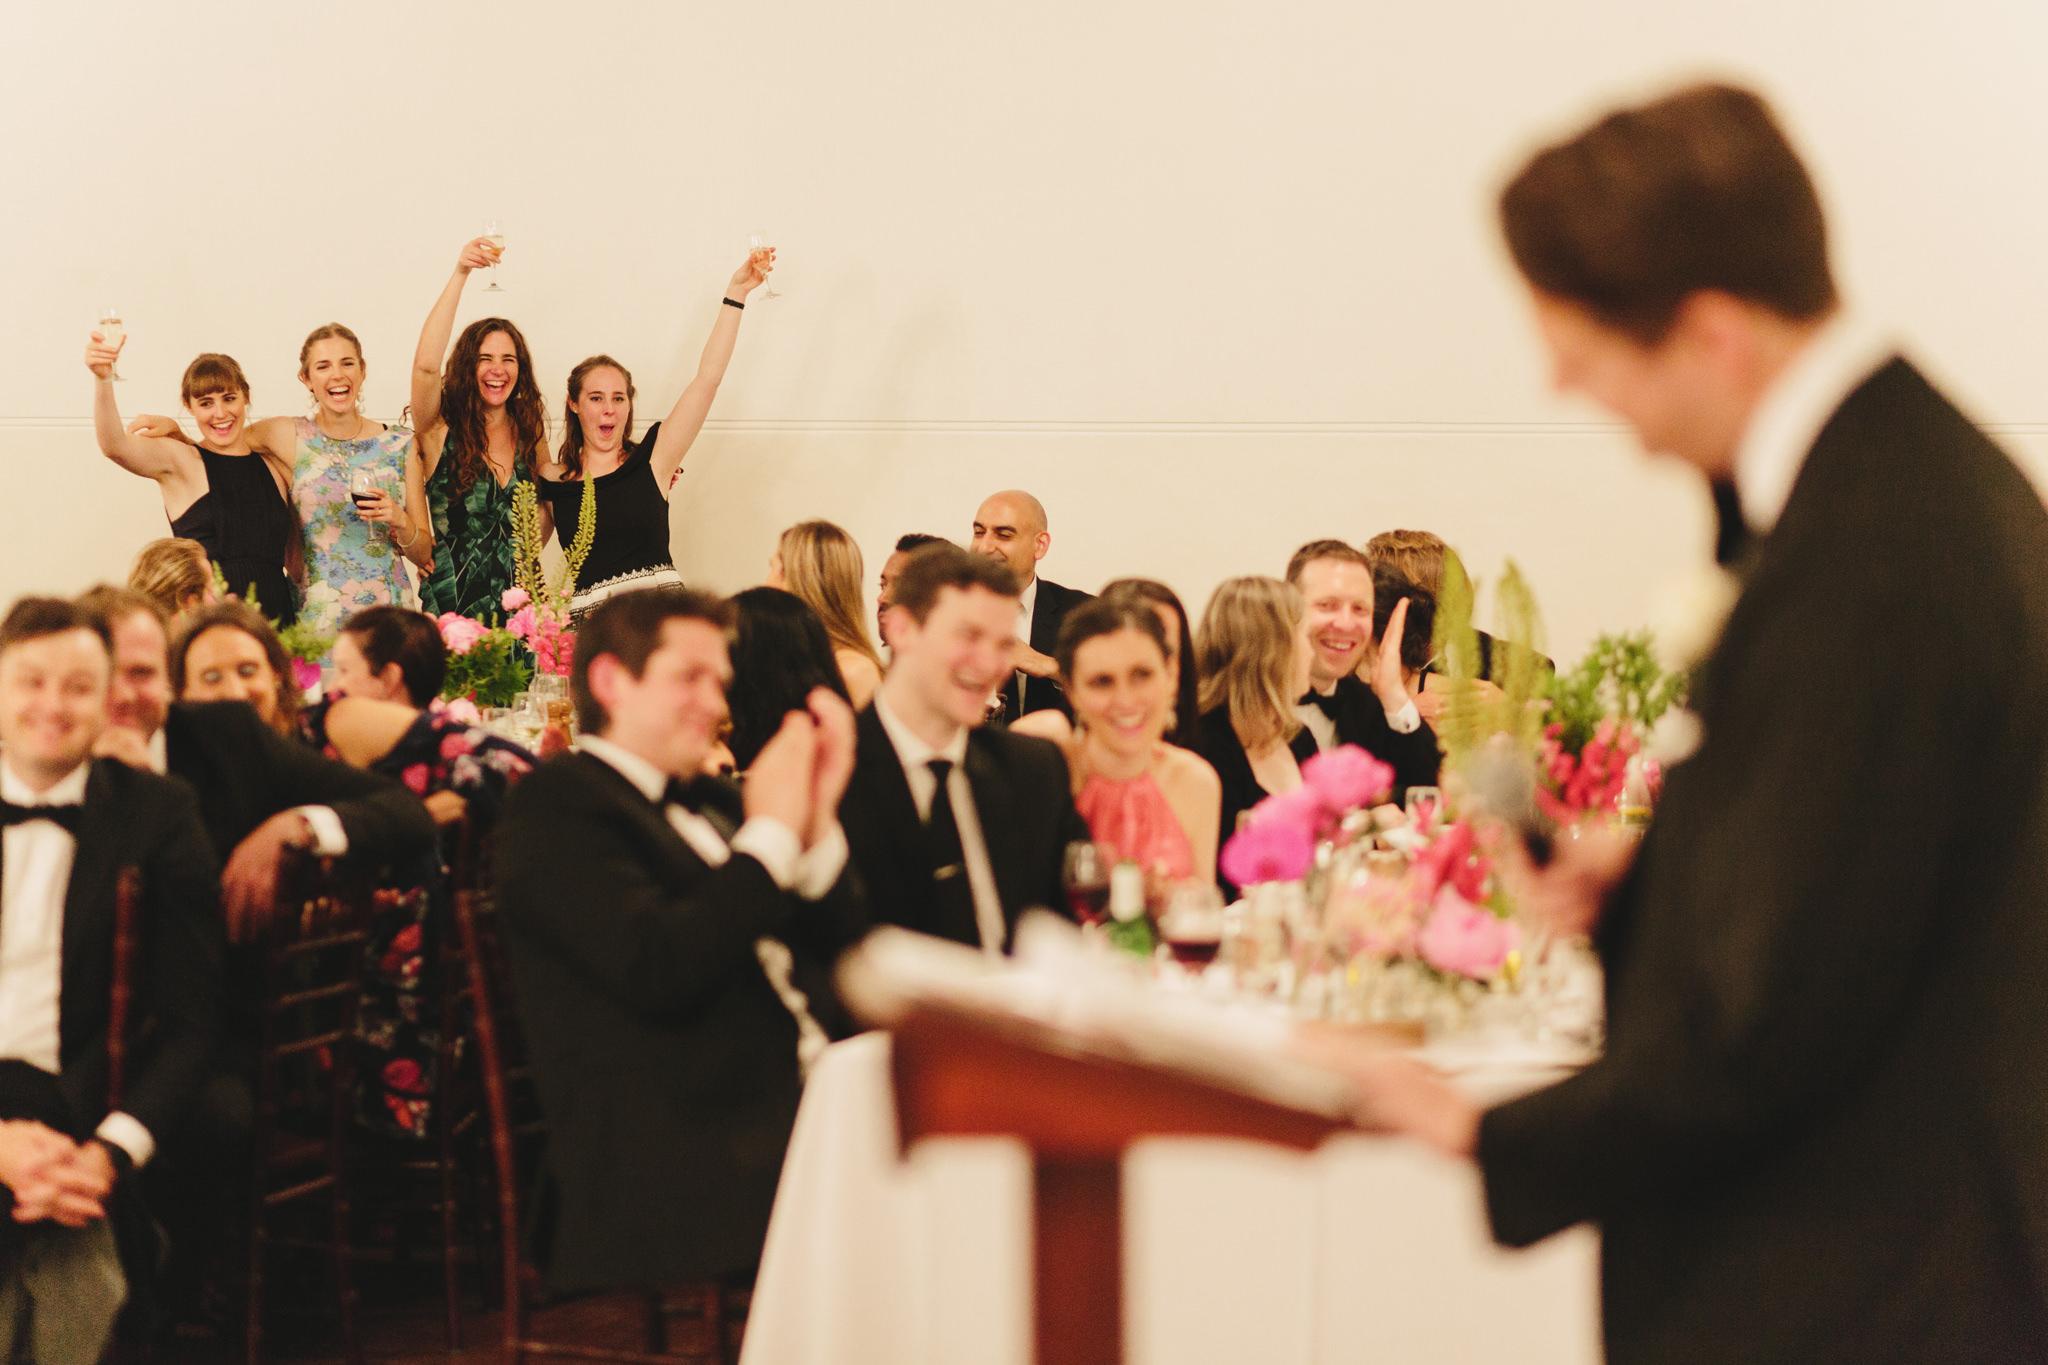 Abbotsford_Convent_Wedding_Peter_Anna133.JPG